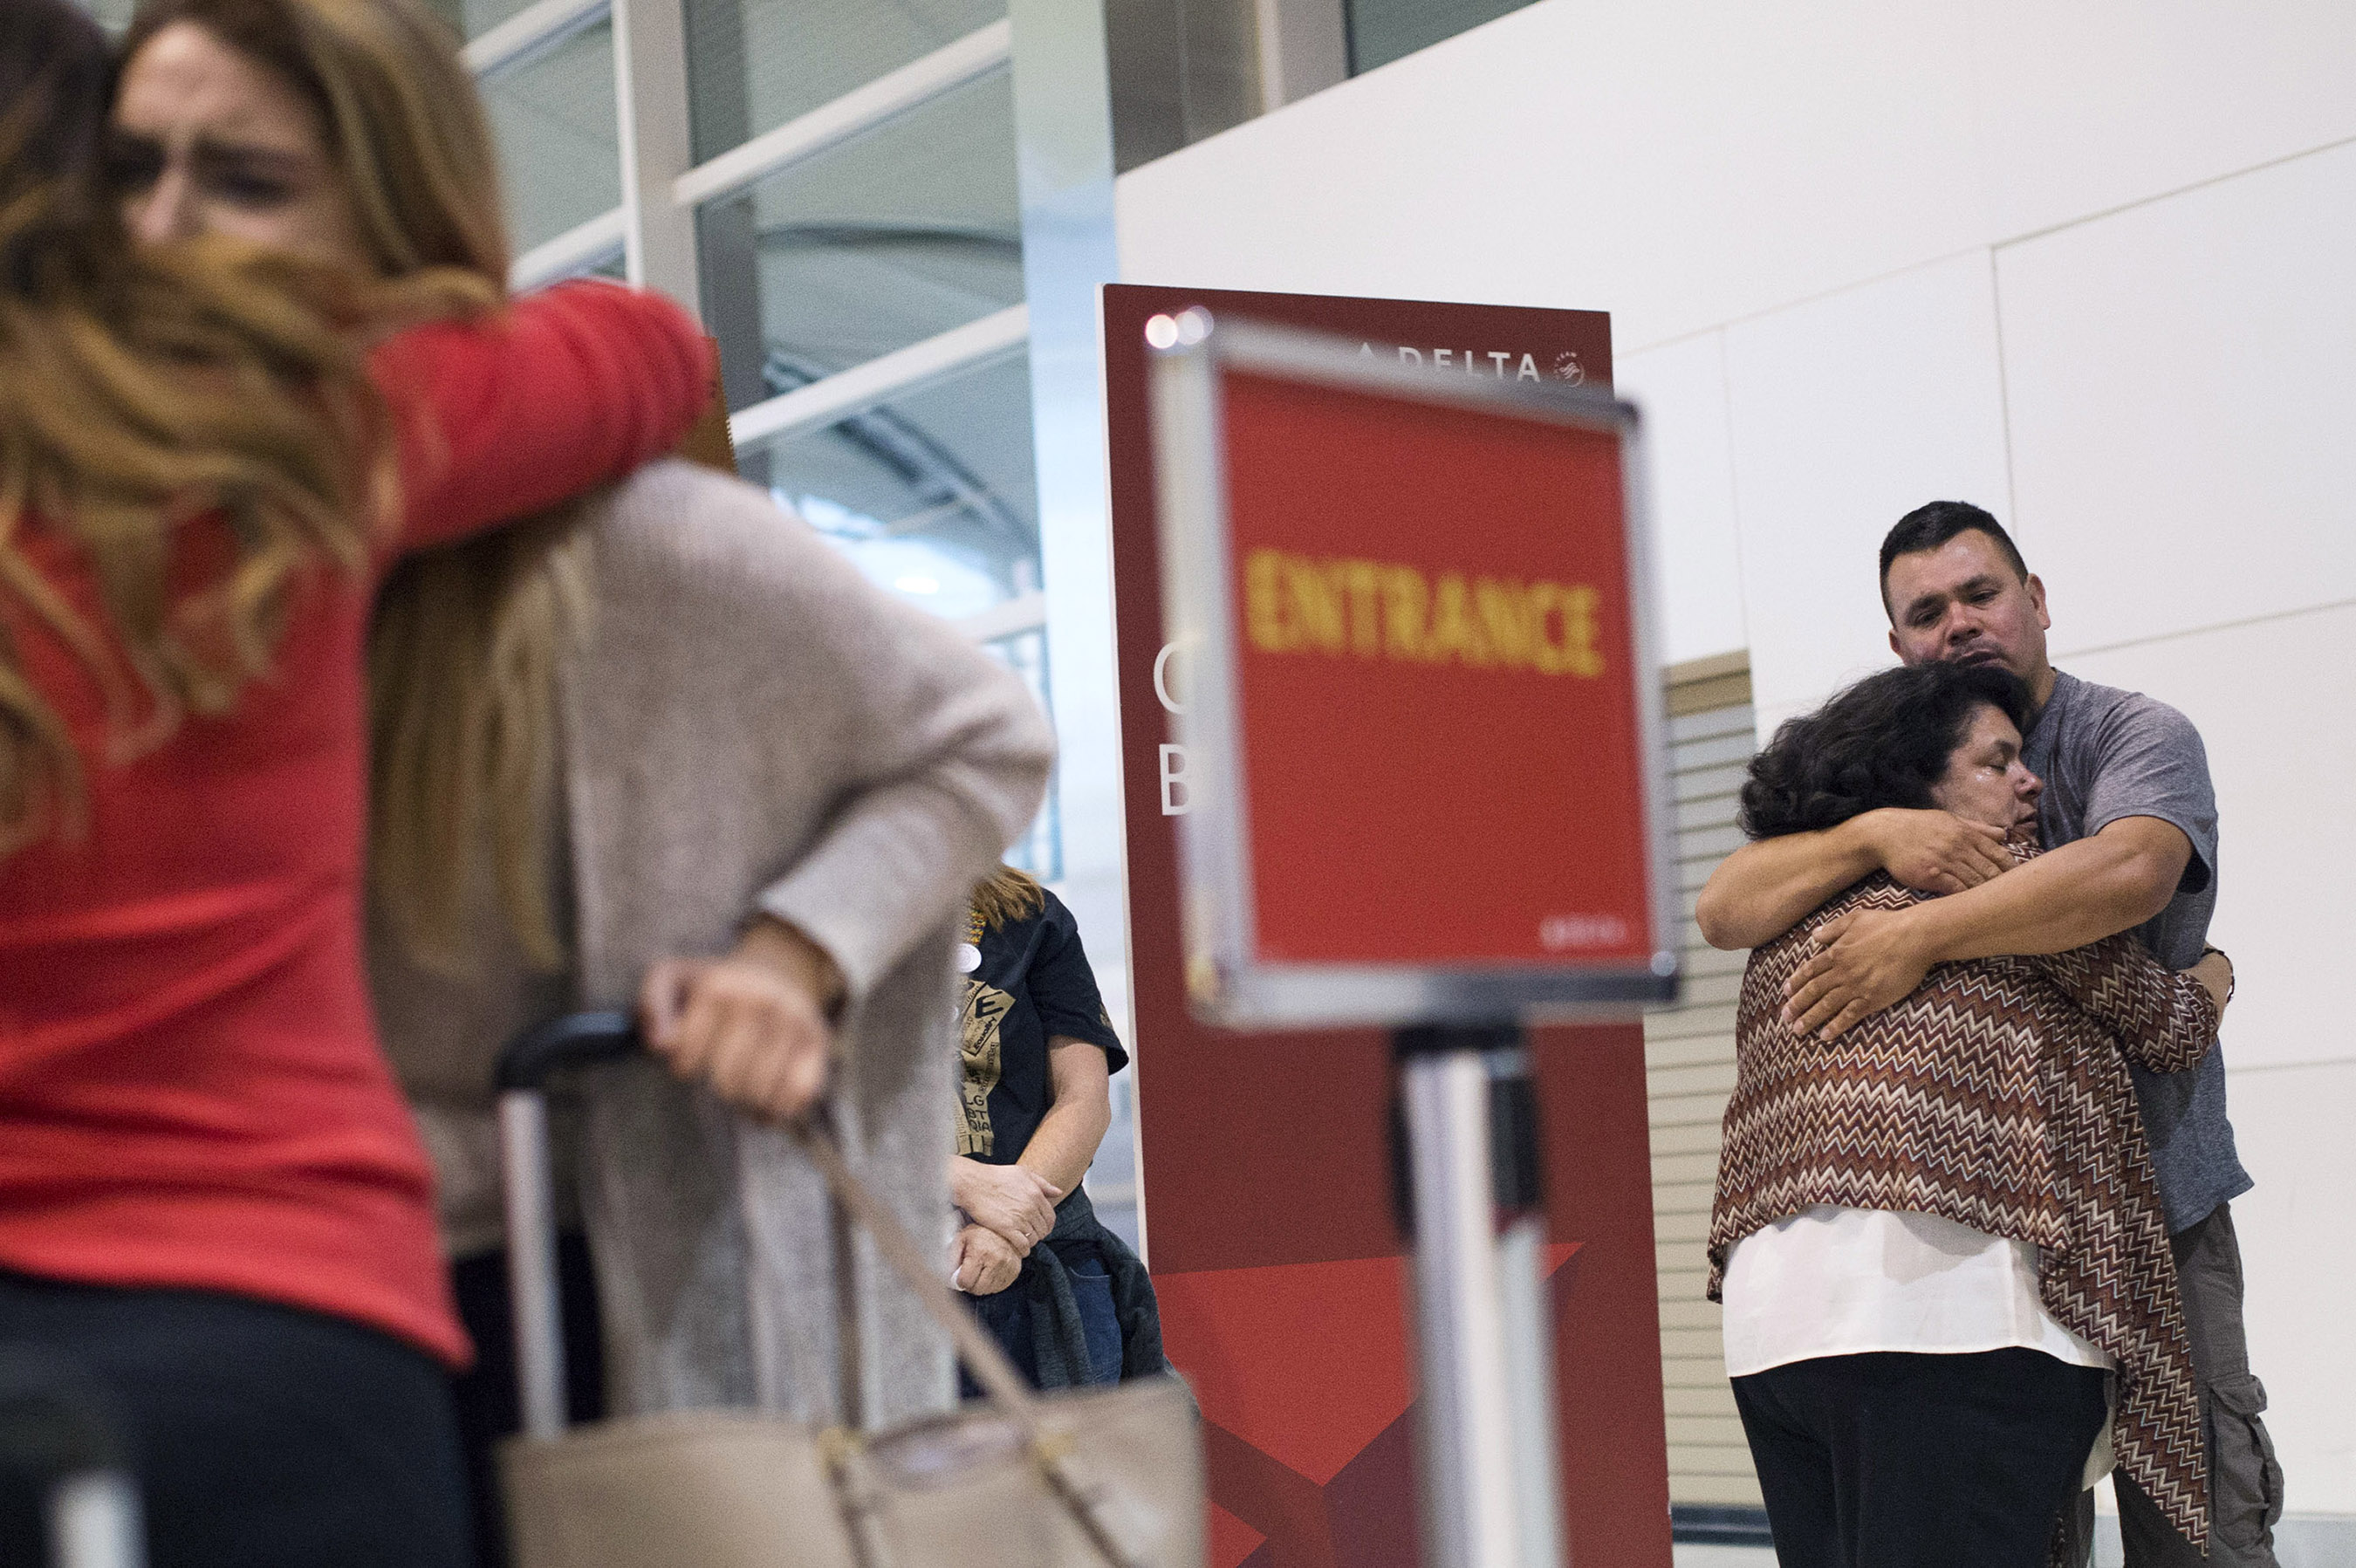 Pamela Quintana-Salazar, 19, hugged a loved one goodbye as her mother, Lourdes Salazar Bautista, hugs her brother, Pedro Salazar